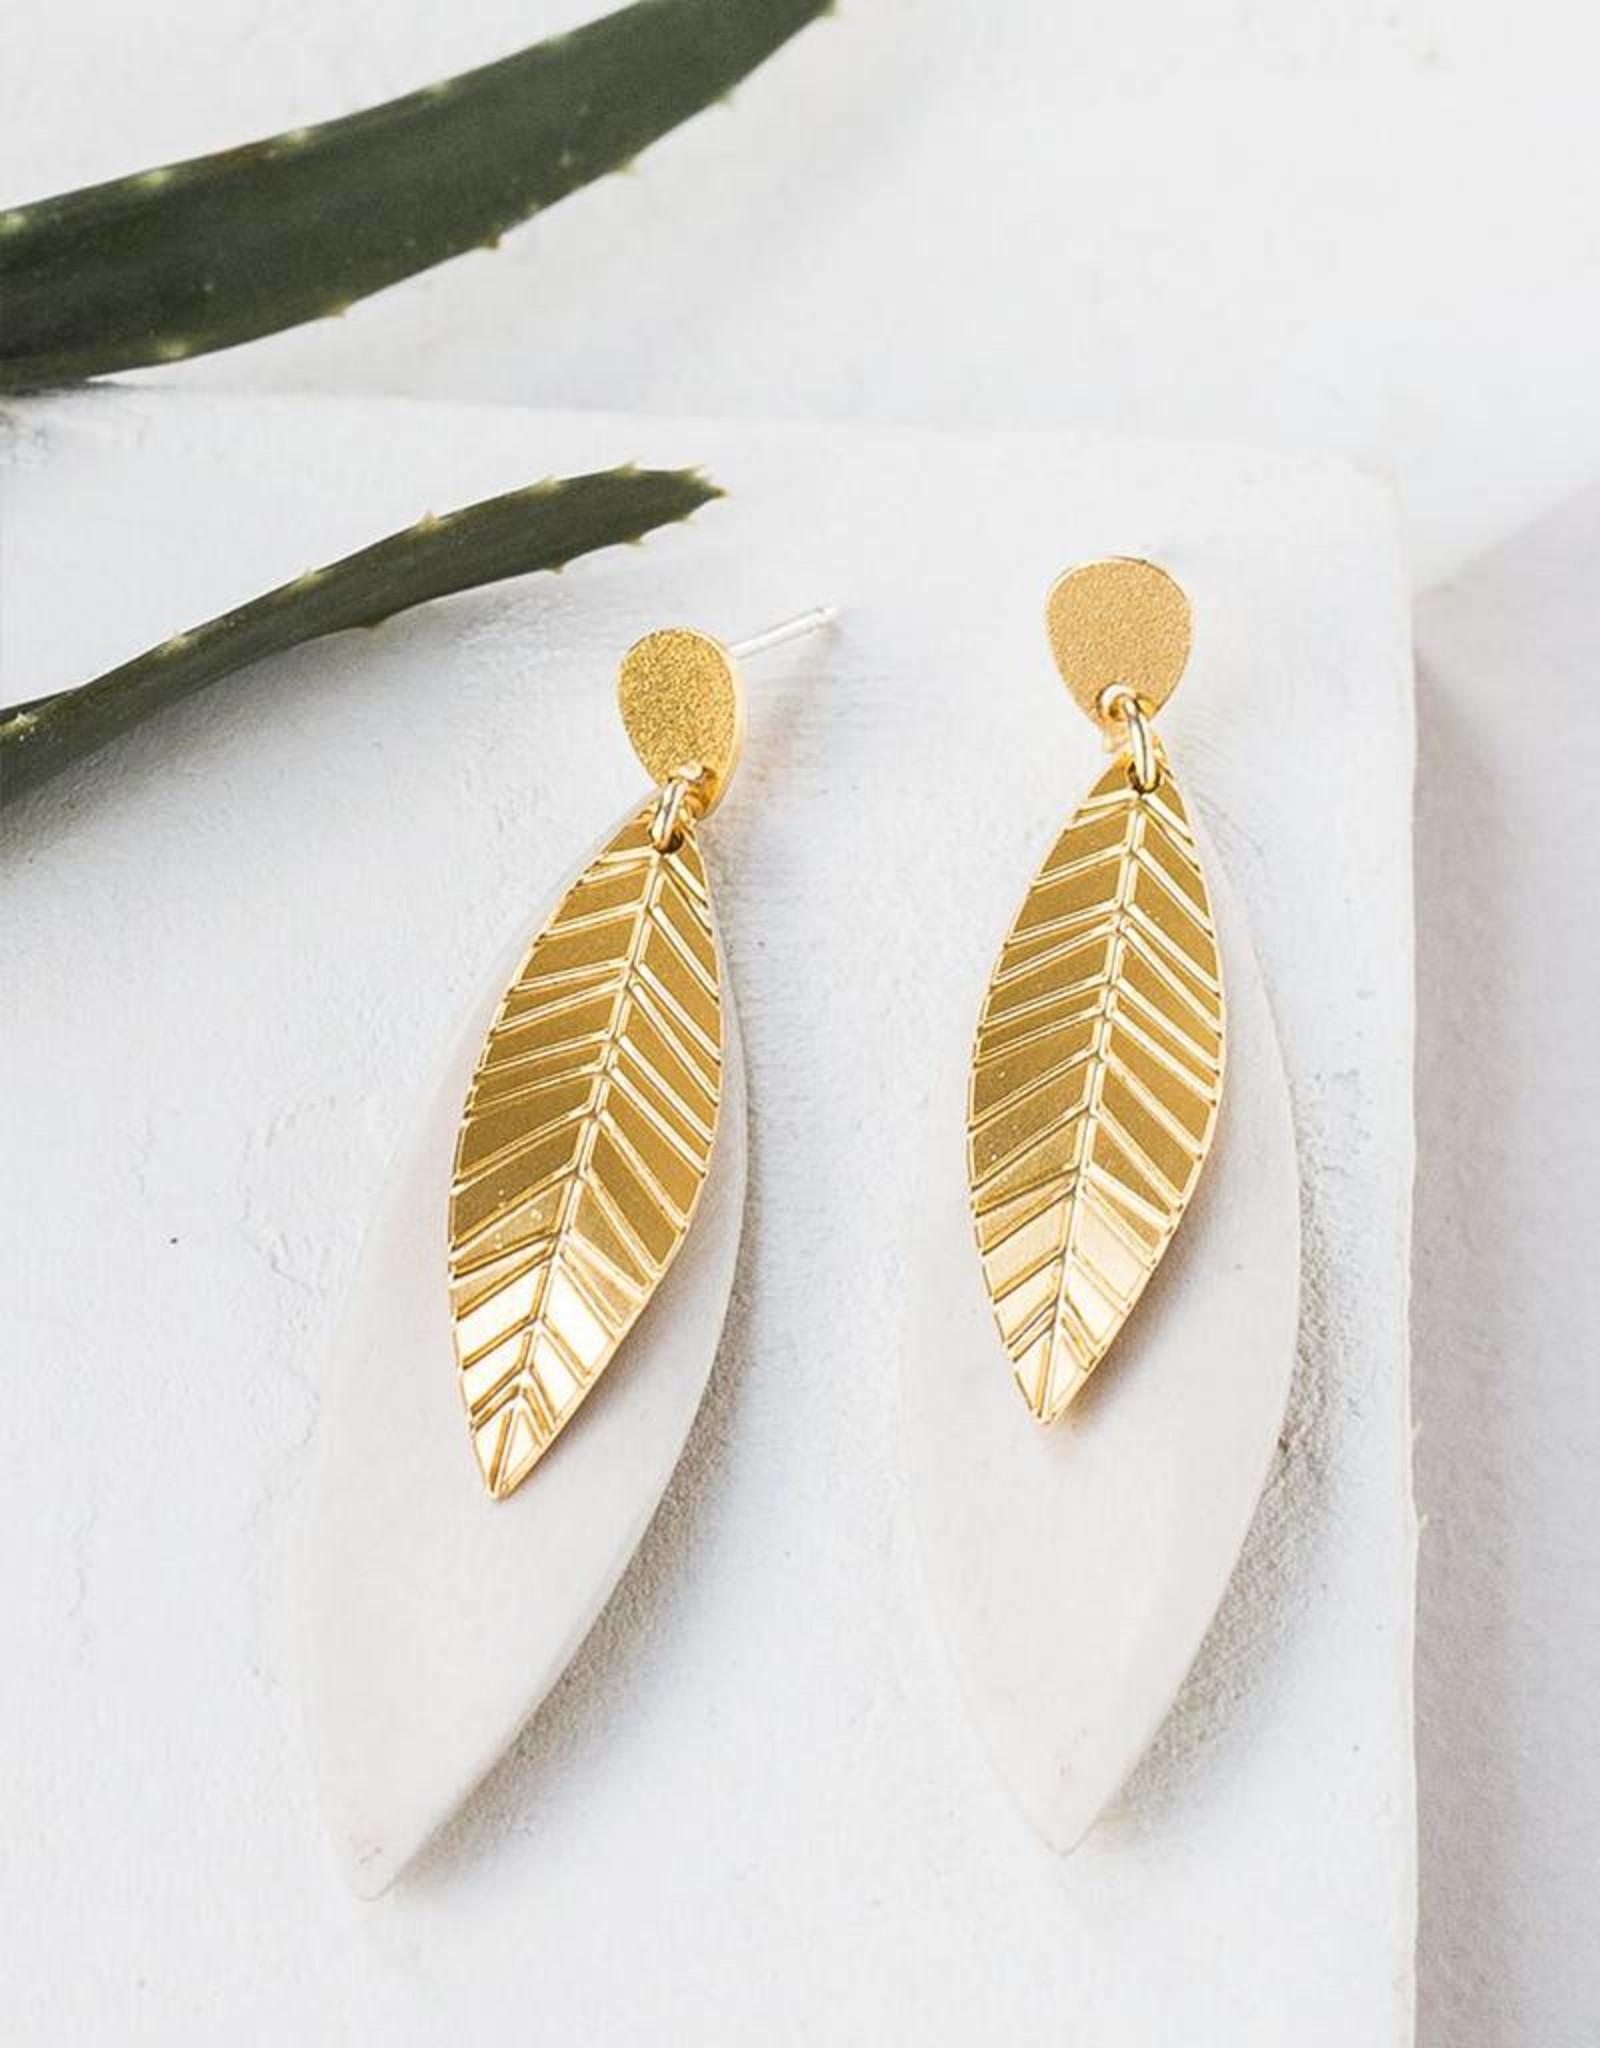 Shlomit Ofir Ivy earrings